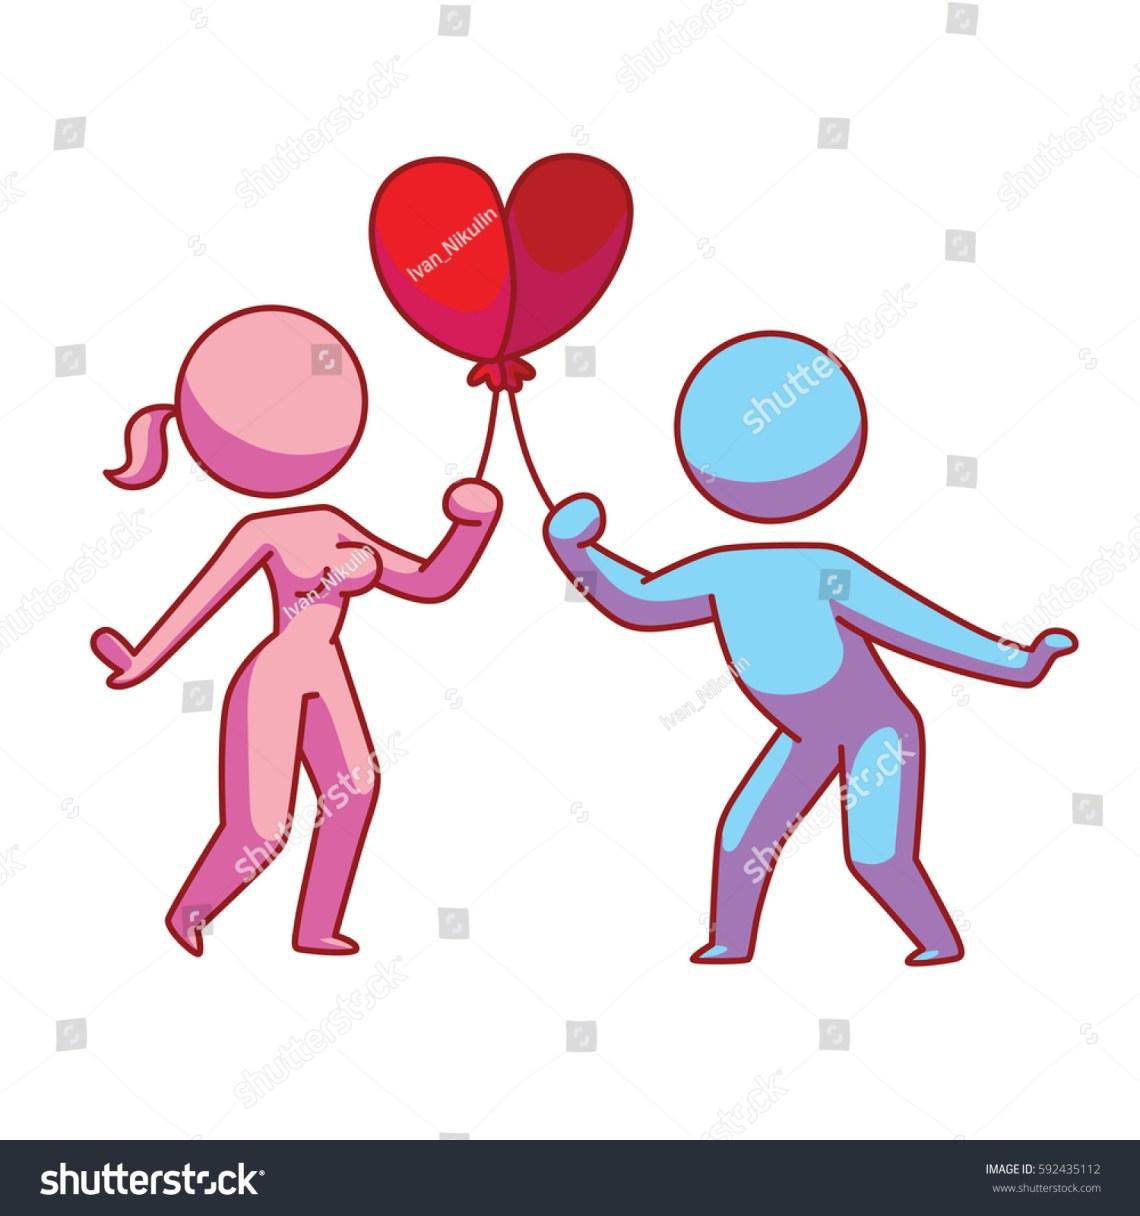 Download Vector Cartoon Image Loving Couple Pink Stock Vector ...